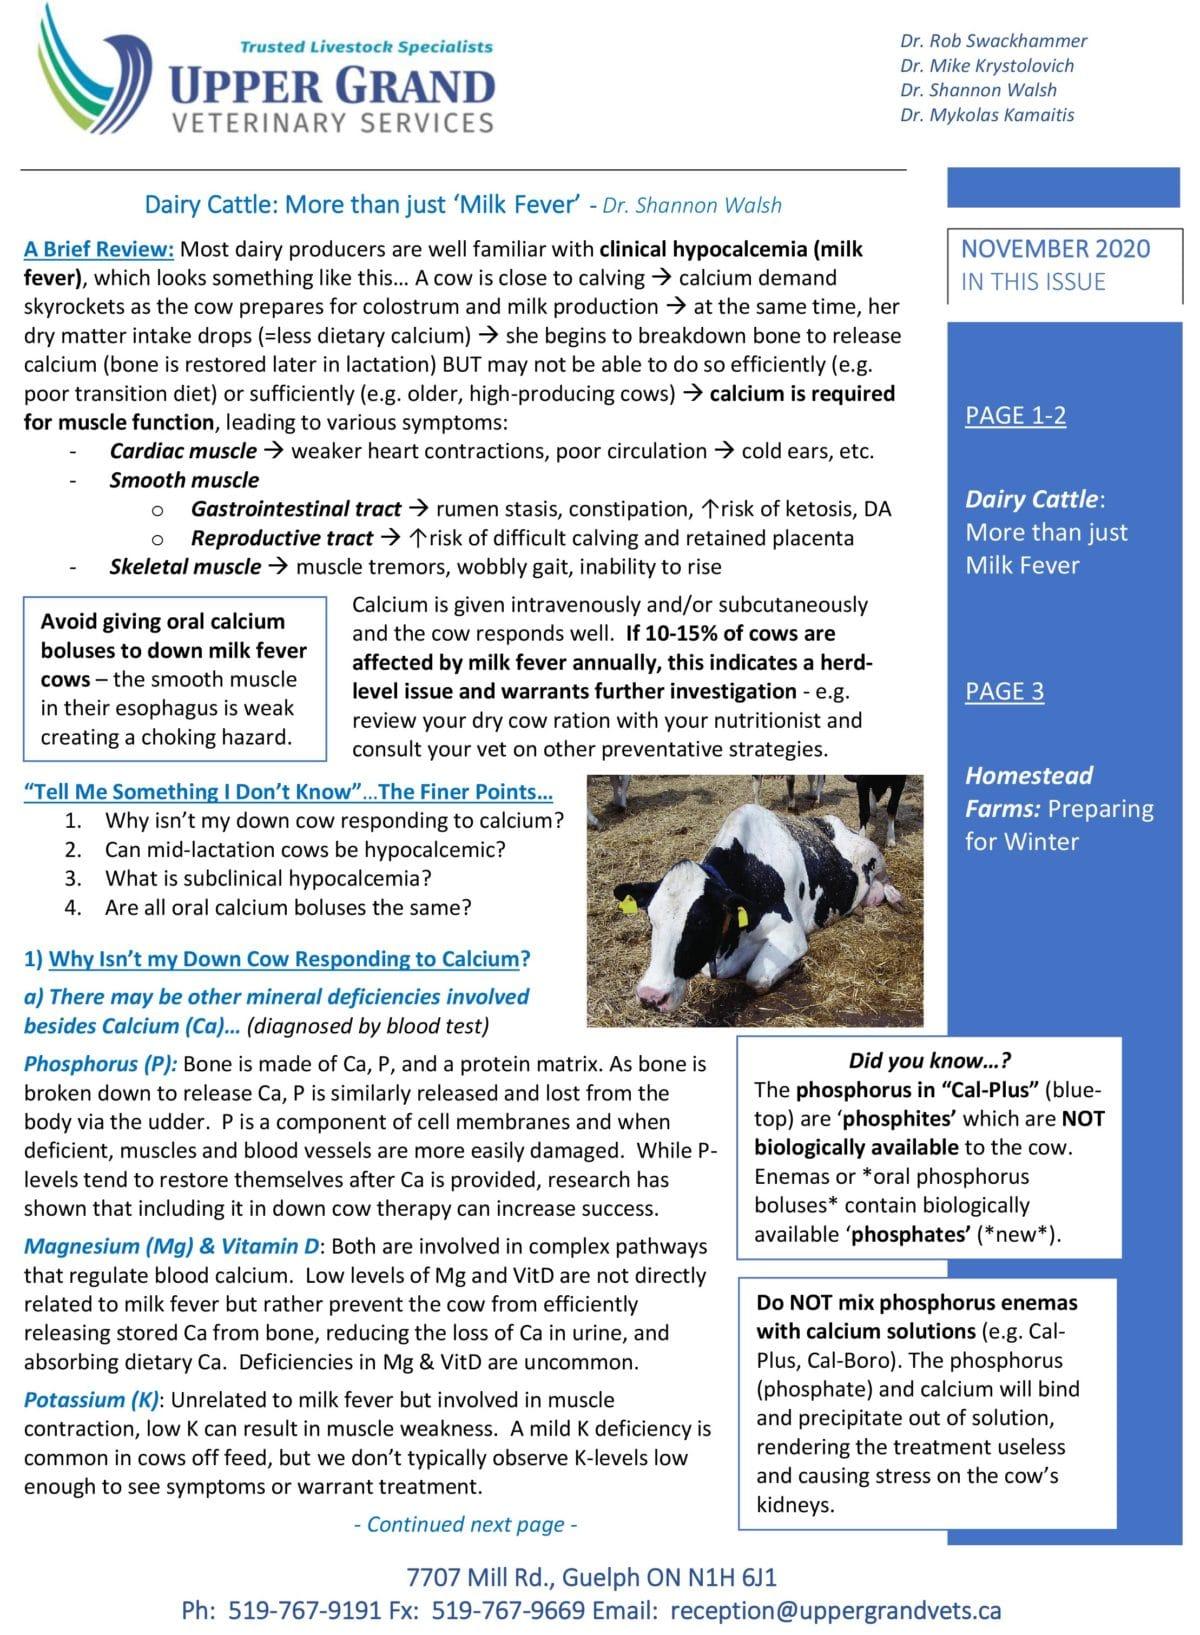 UGVS-Newsletter_Nov-2020-1-copy-1200x1635.jpg